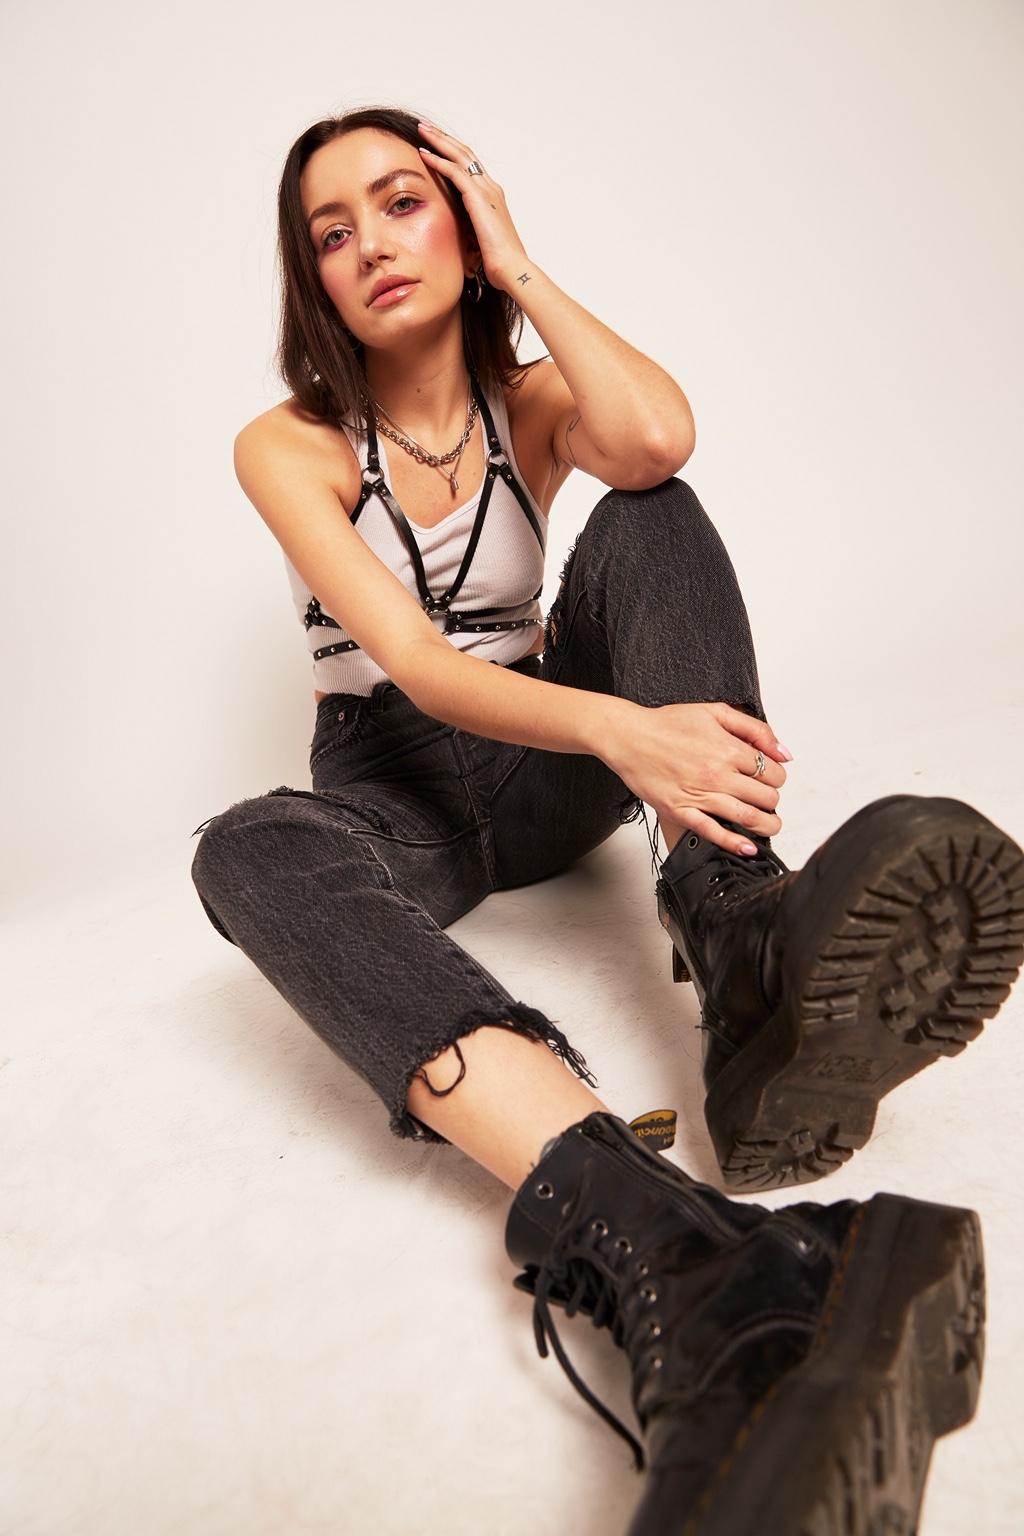 Photographer: Sergio Necoechea | Model: Cristina LaFornara | Makeup by Ashley Tani